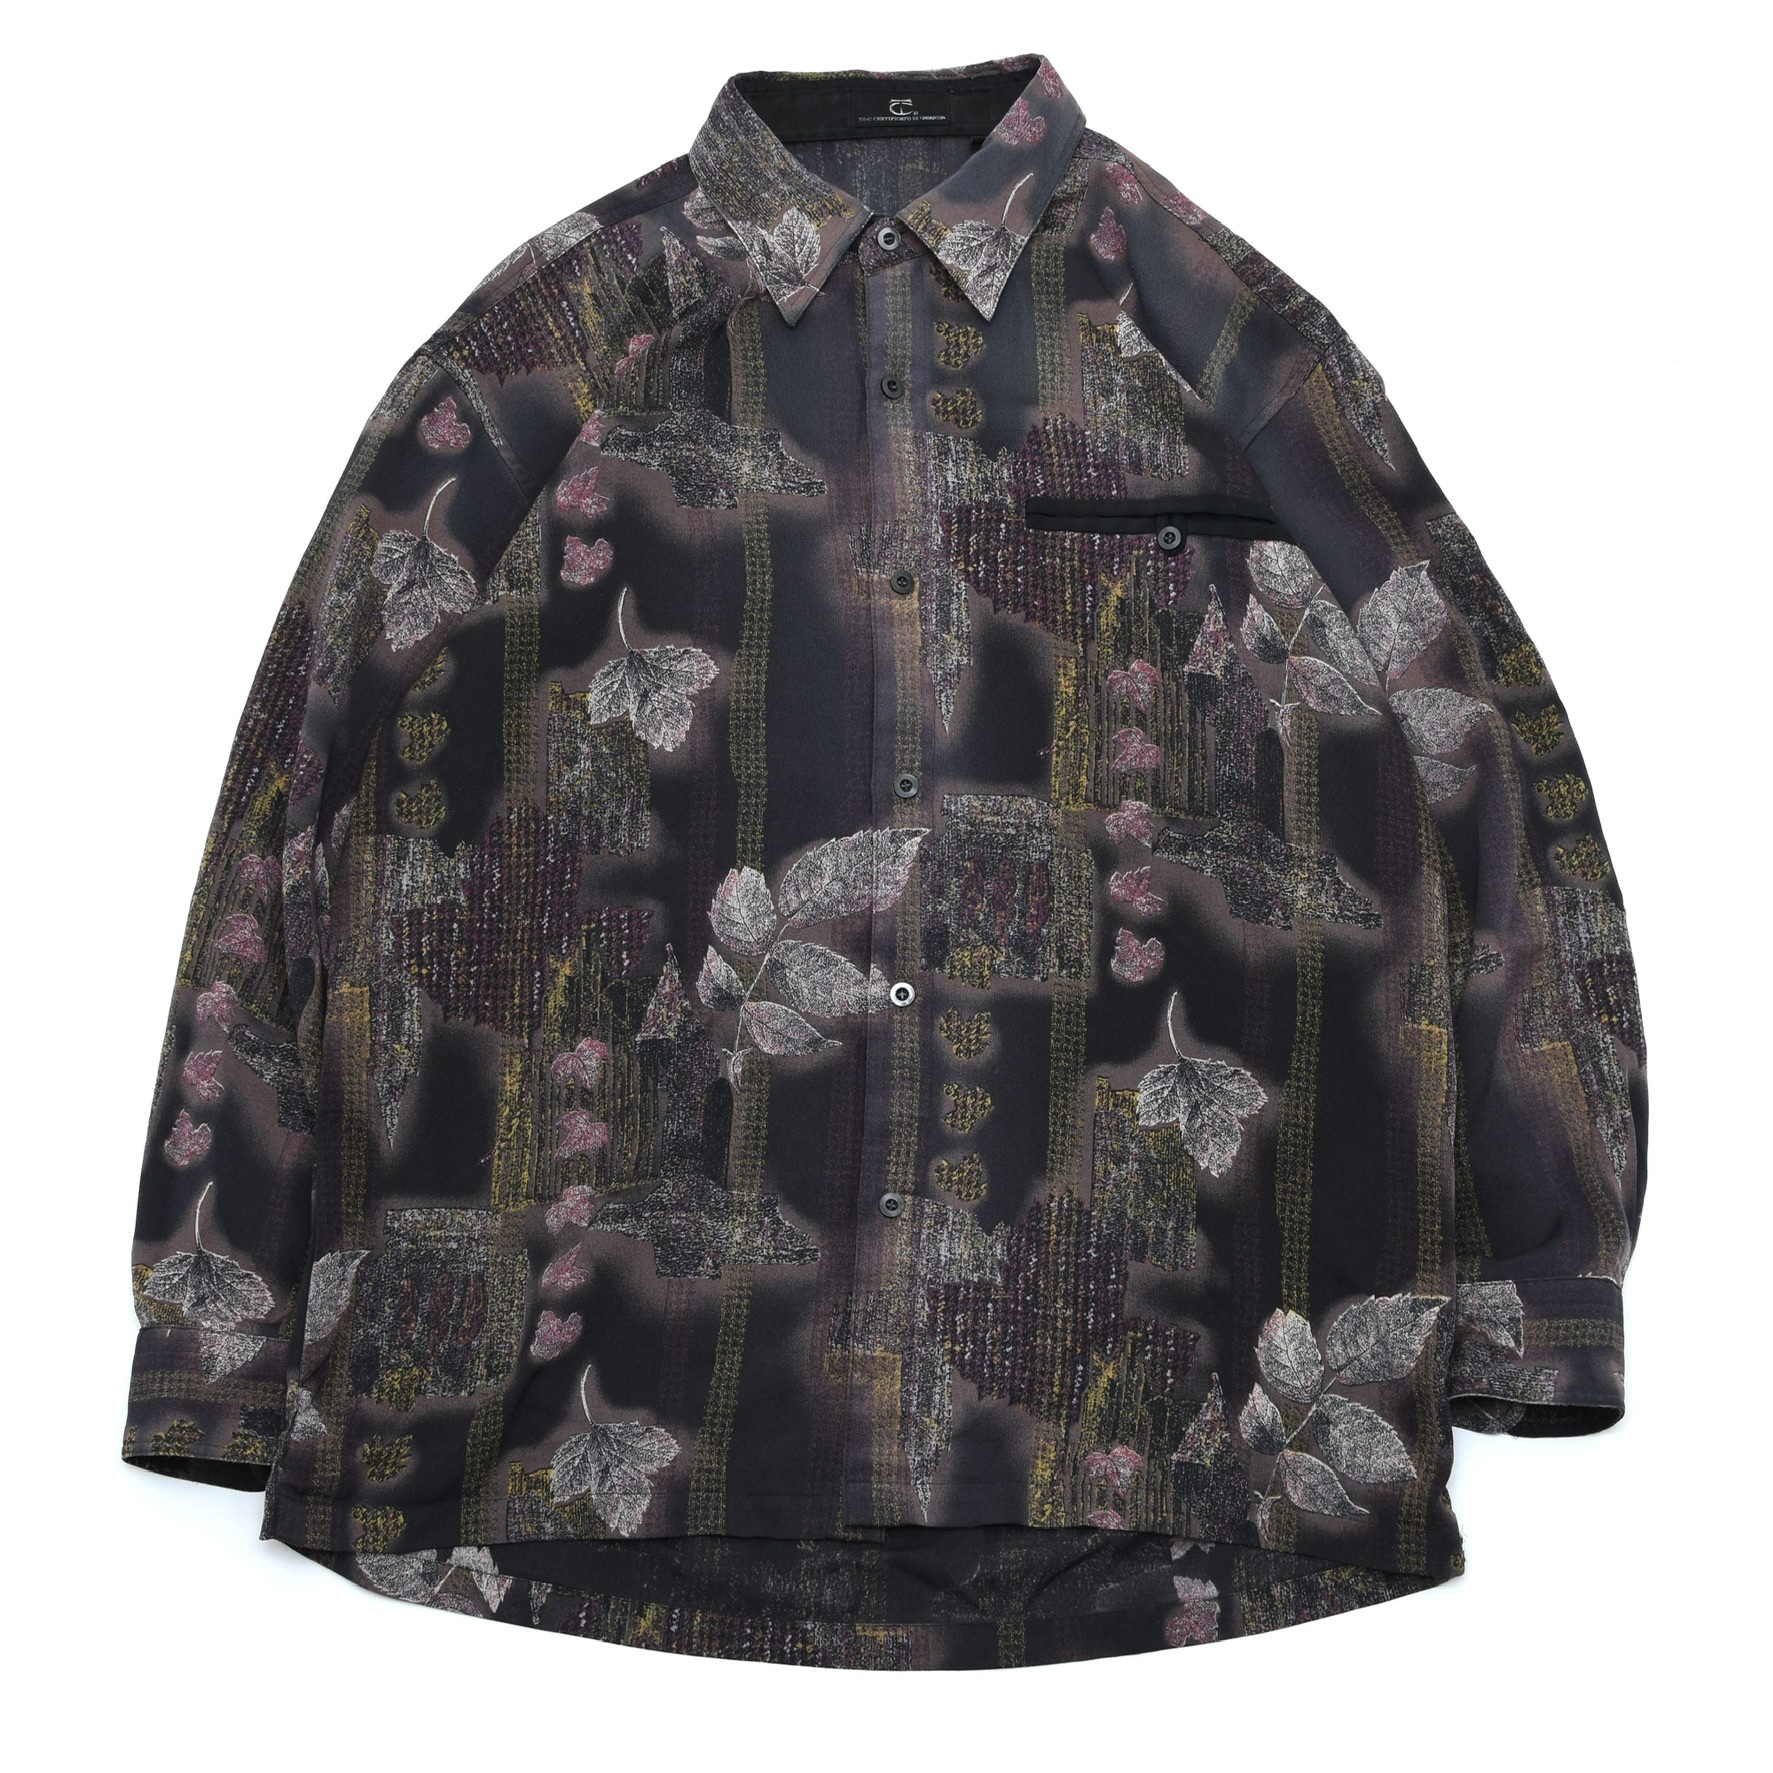 Mysterious full pattern shirt